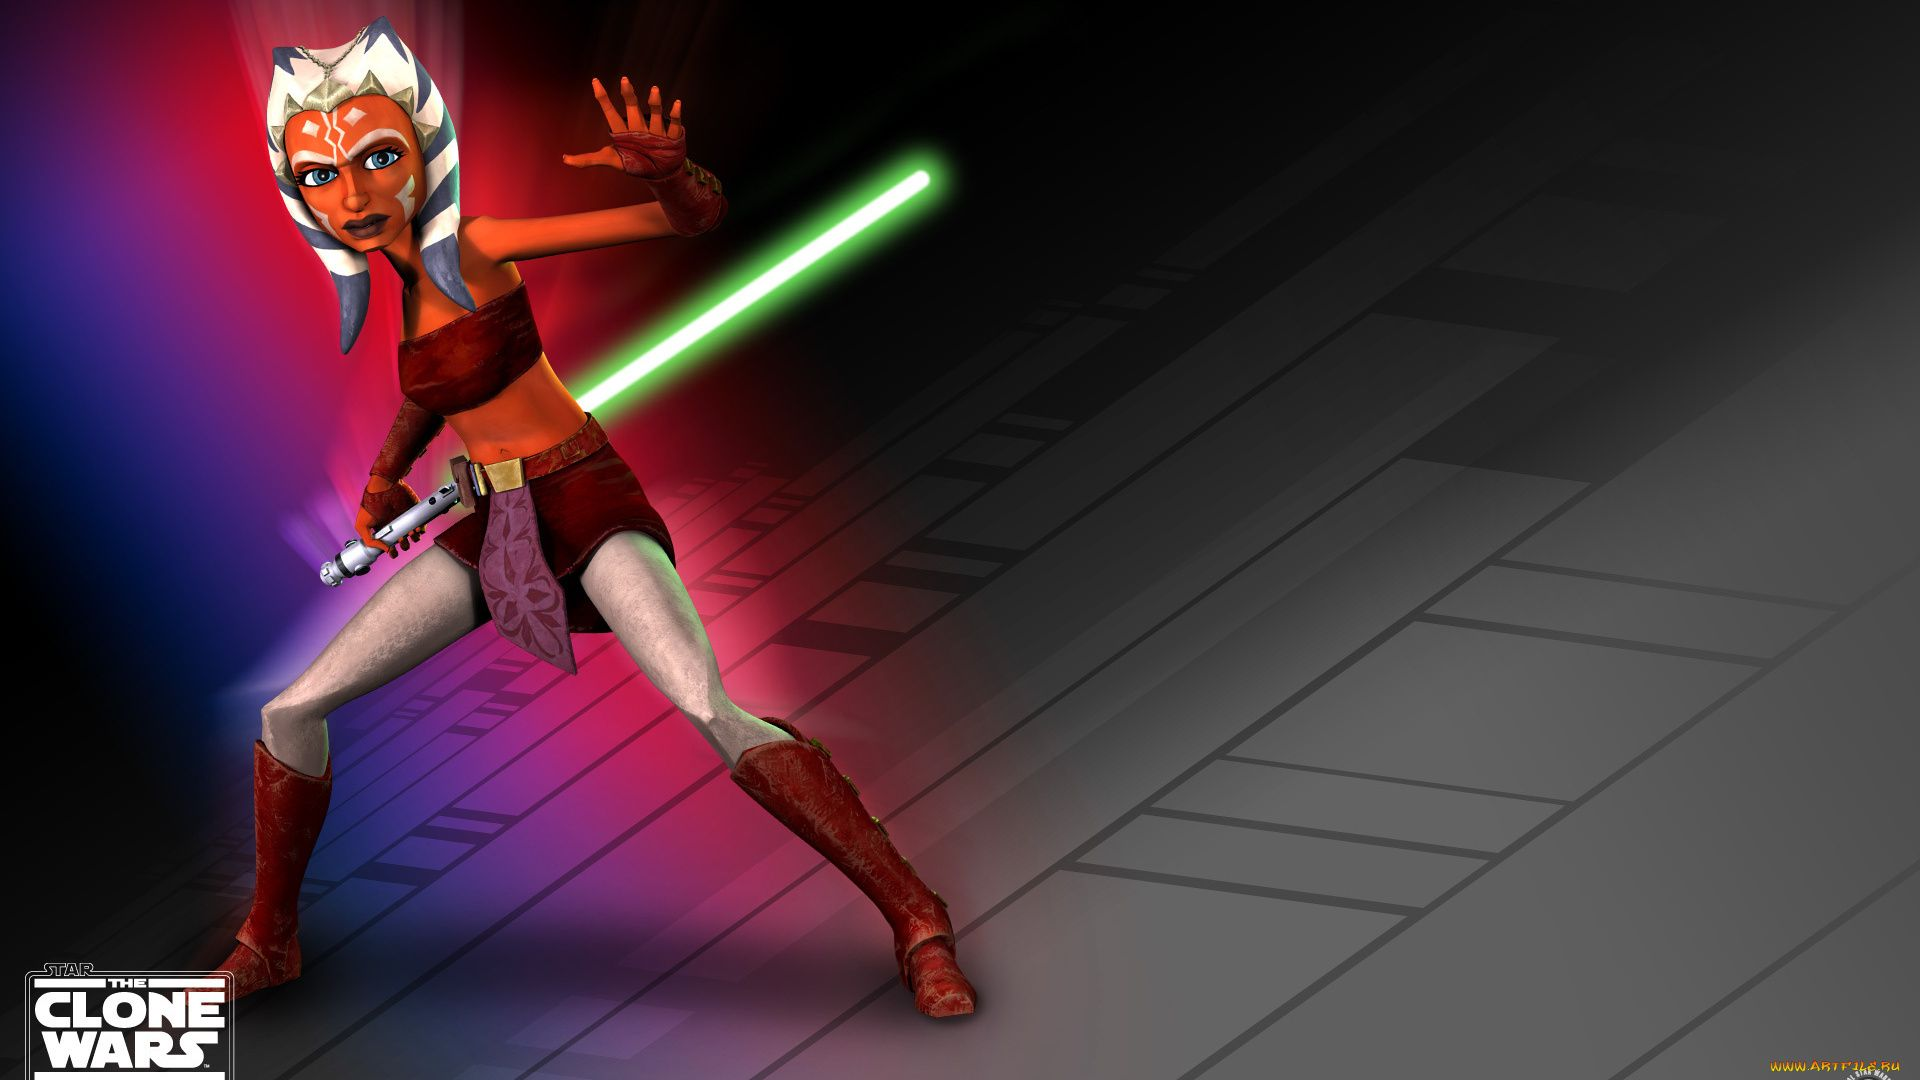 Star Wars The Clone Wars Ahsoka Tano 2